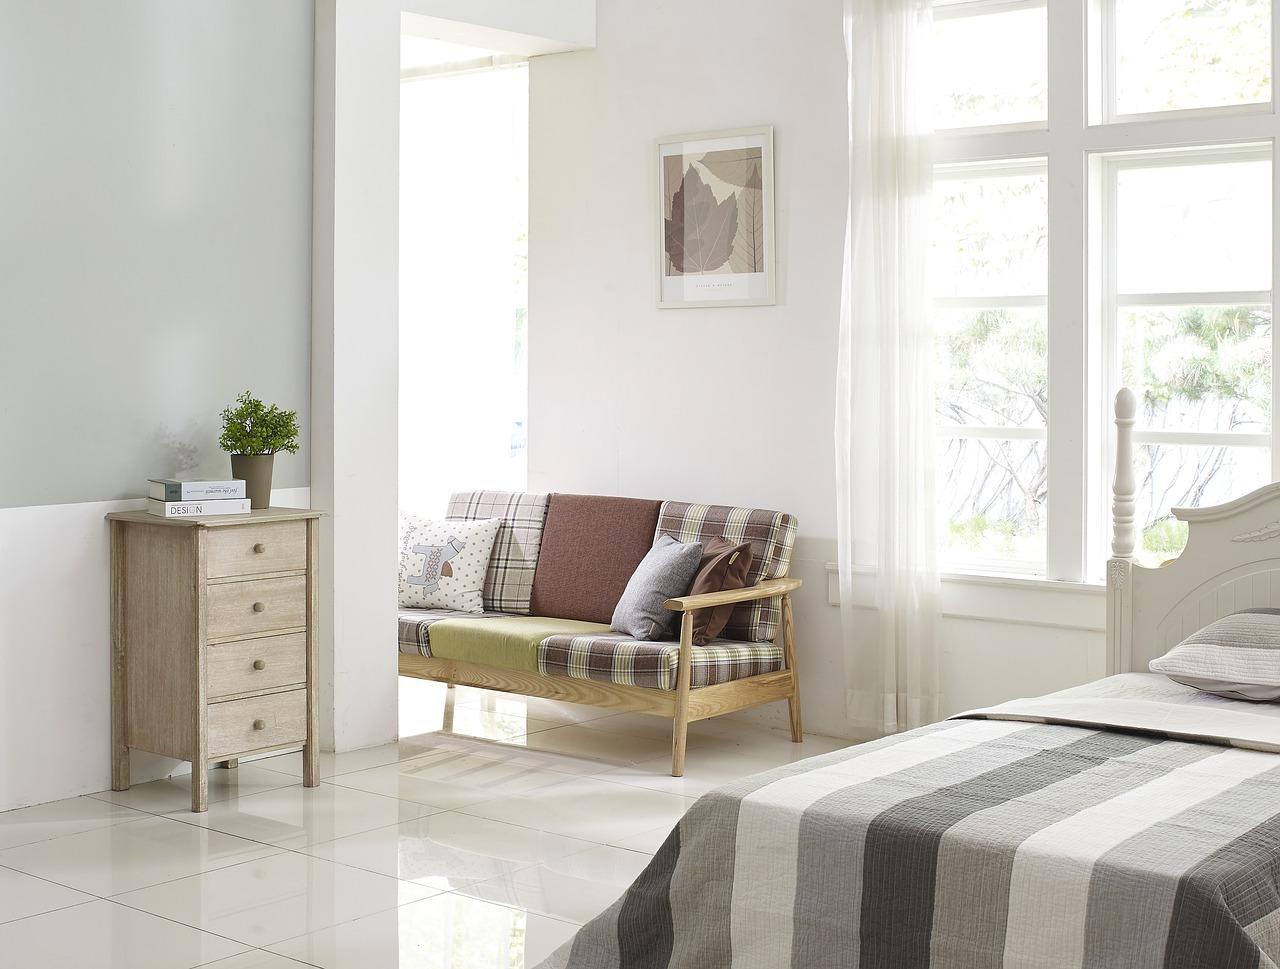 BedJet V2 Climate Comfort System Review